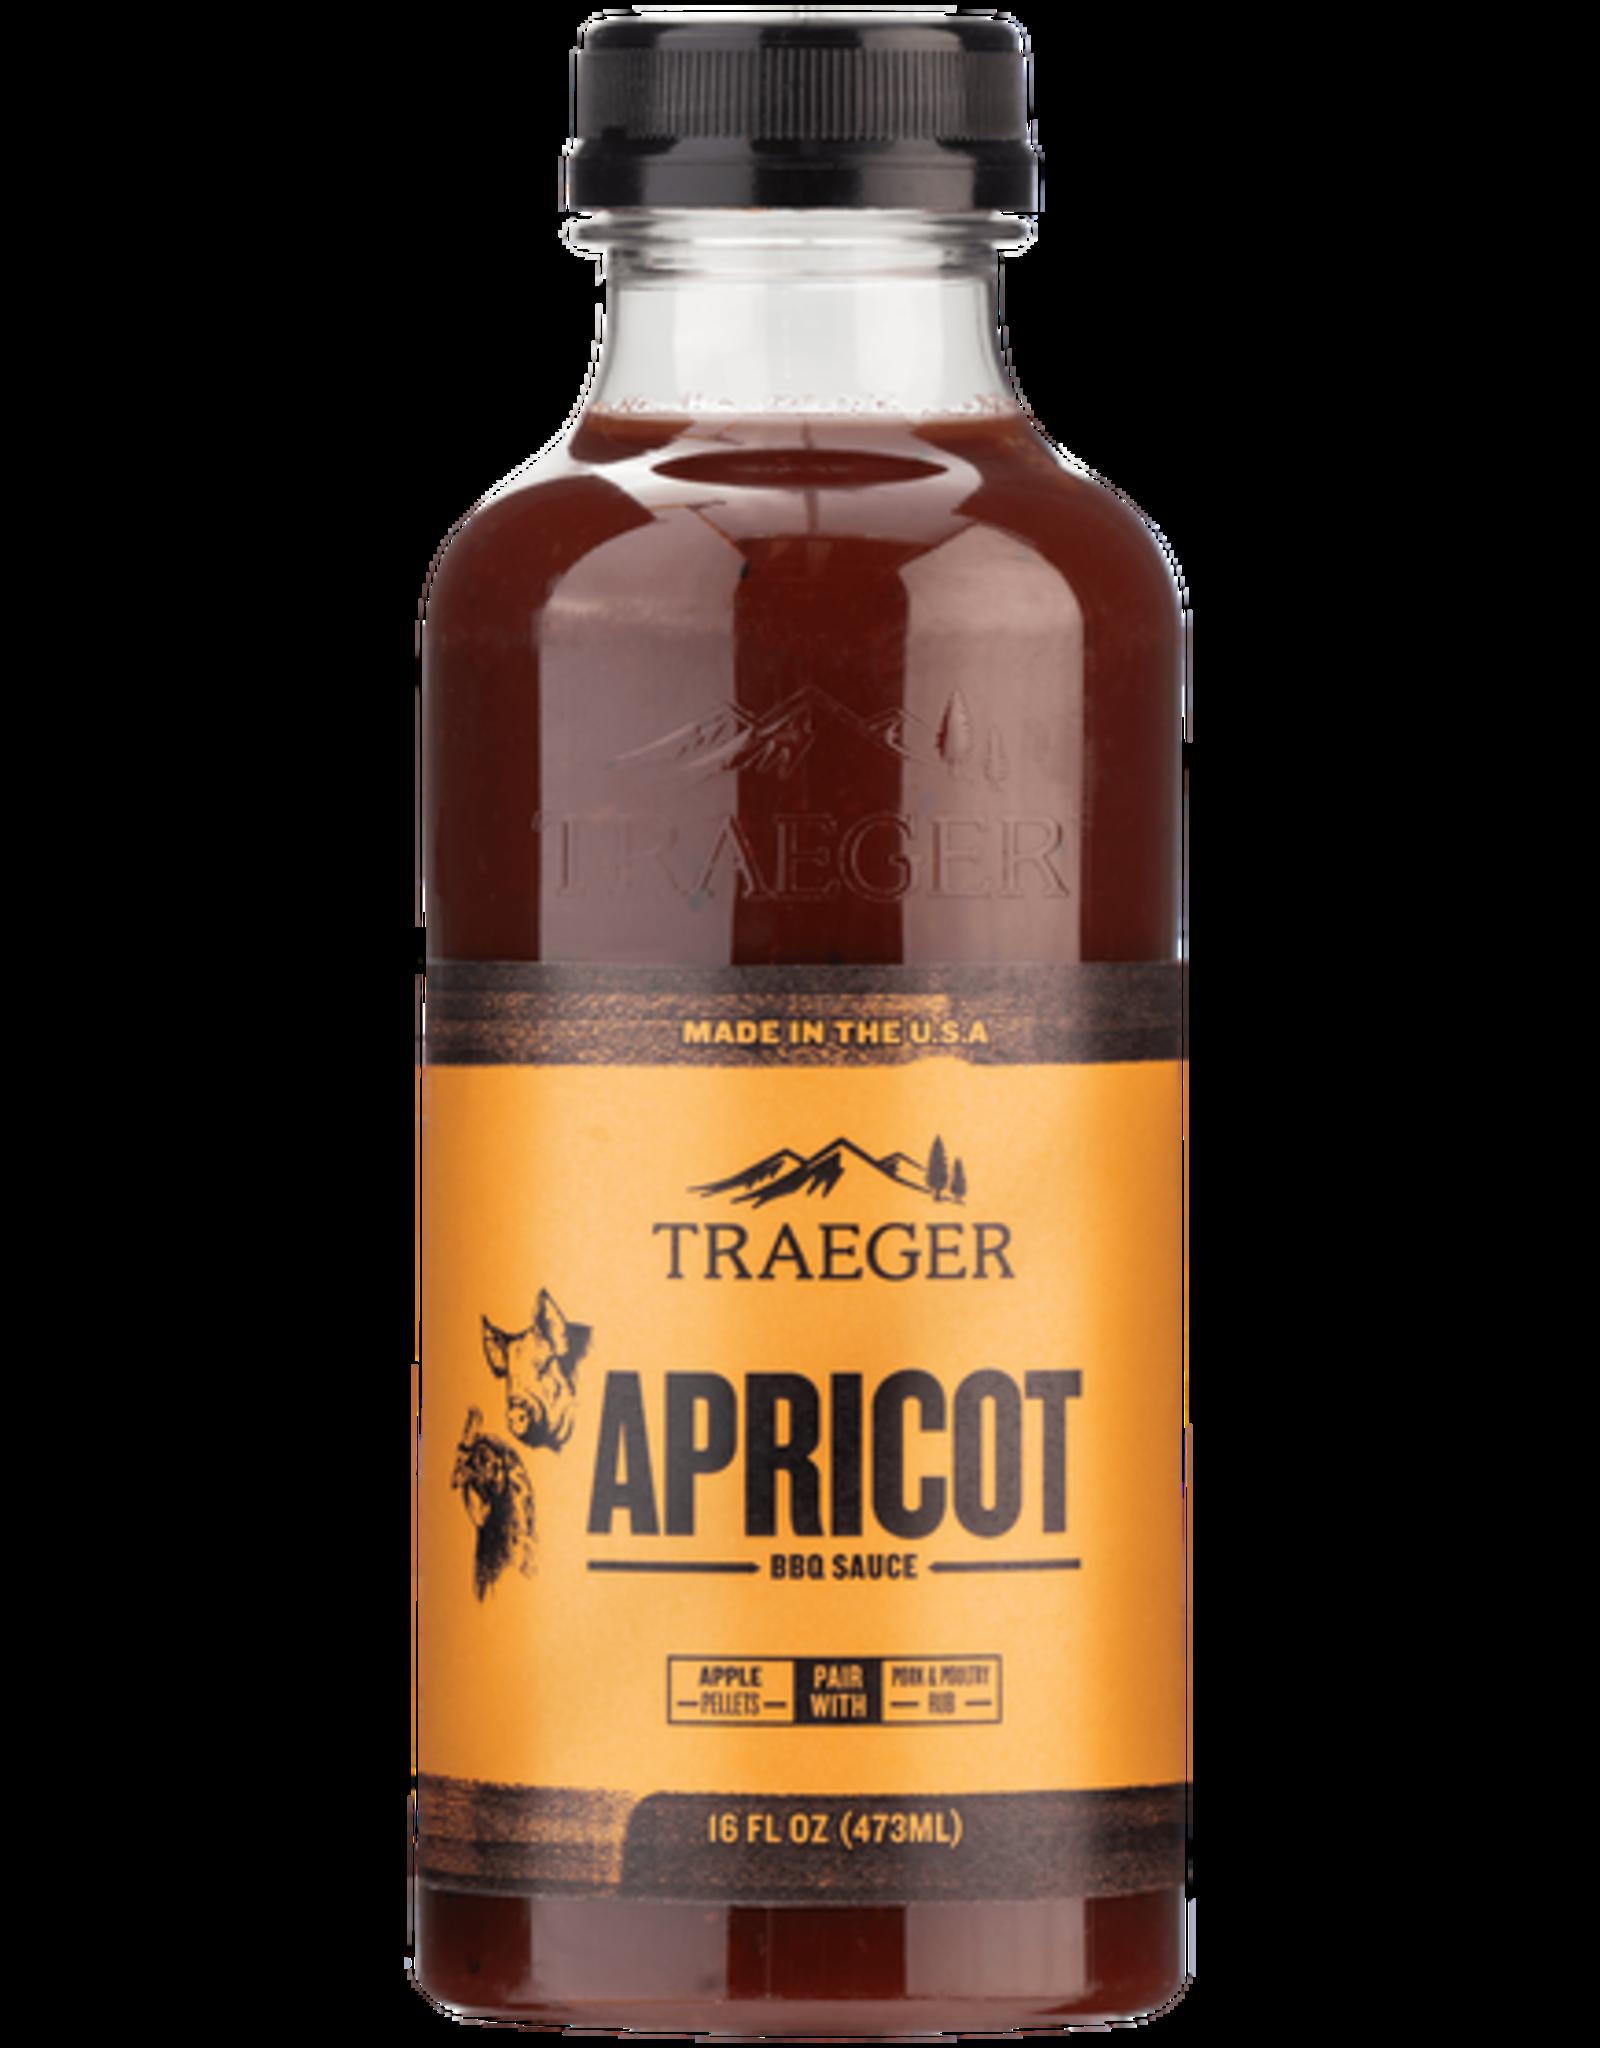 Traeger APRICOT SAUCE 16 OZ